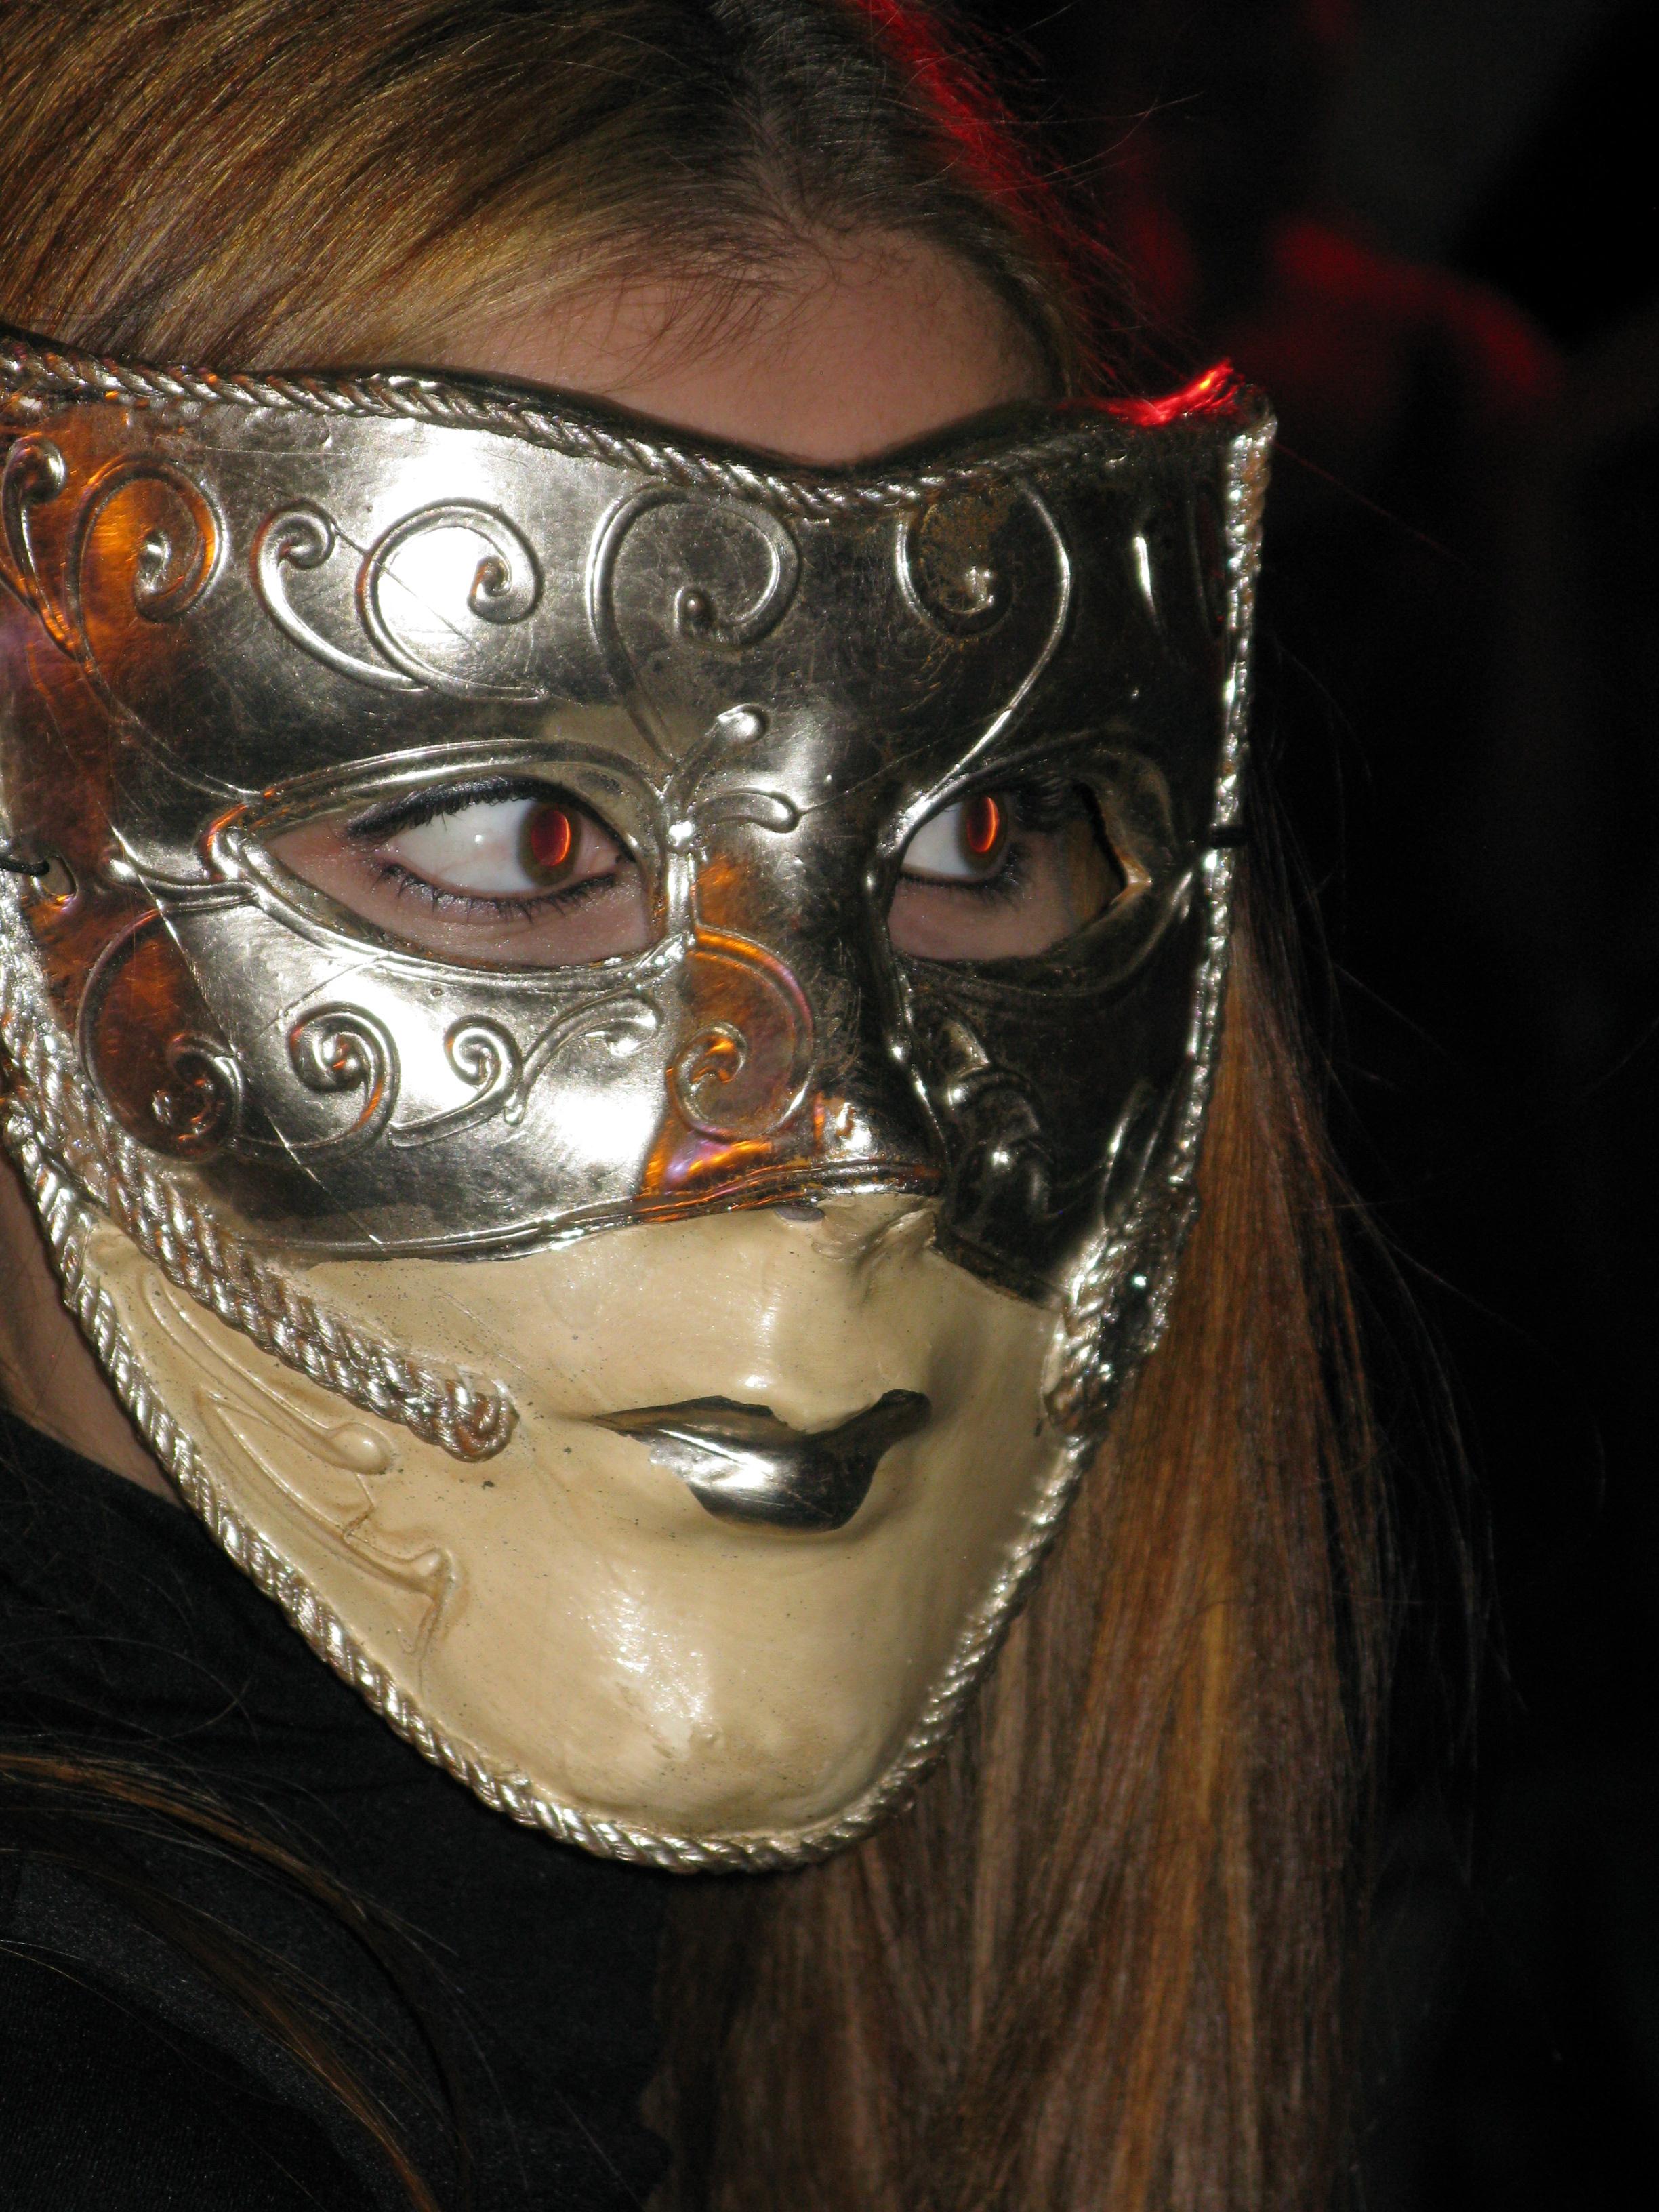 masked woman at Notte Bianca - Lejl Imdawwal